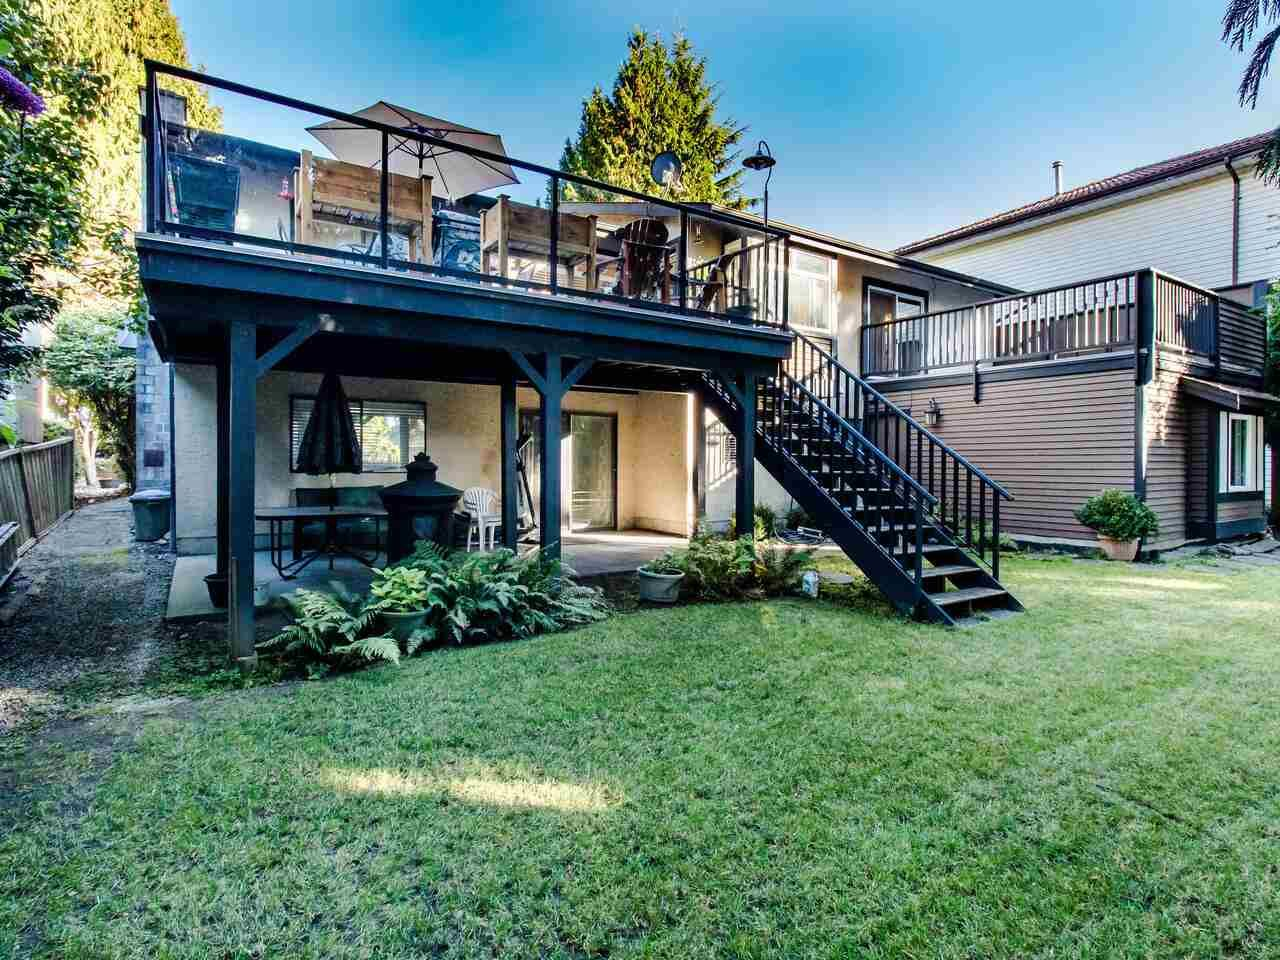 Photo 22: Photos: 11505 PEMBERTON Crescent in Delta: Annieville House for sale (N. Delta)  : MLS®# R2512135